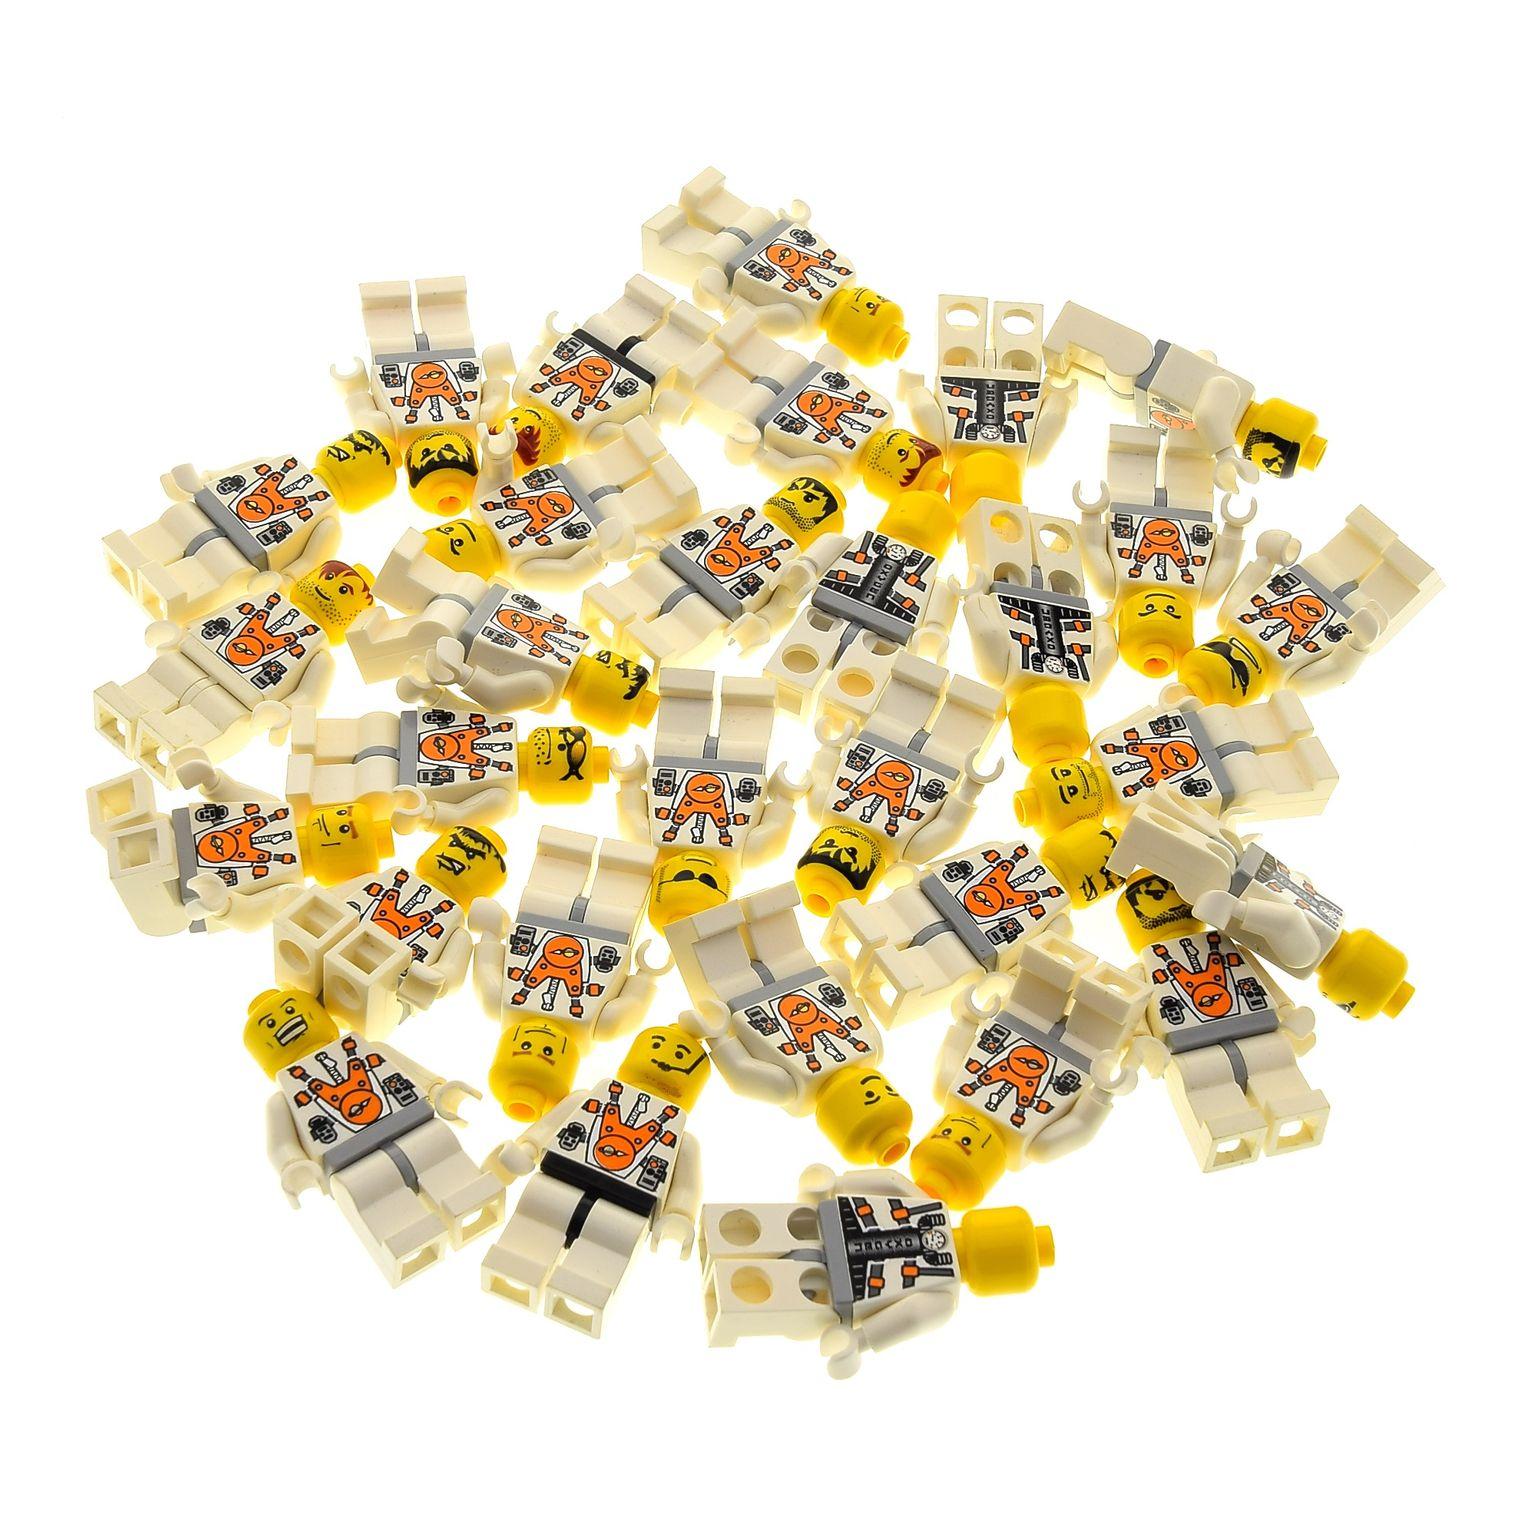 5 X Lego System City Mini Figuren Astronaut Space Weltraum Torso